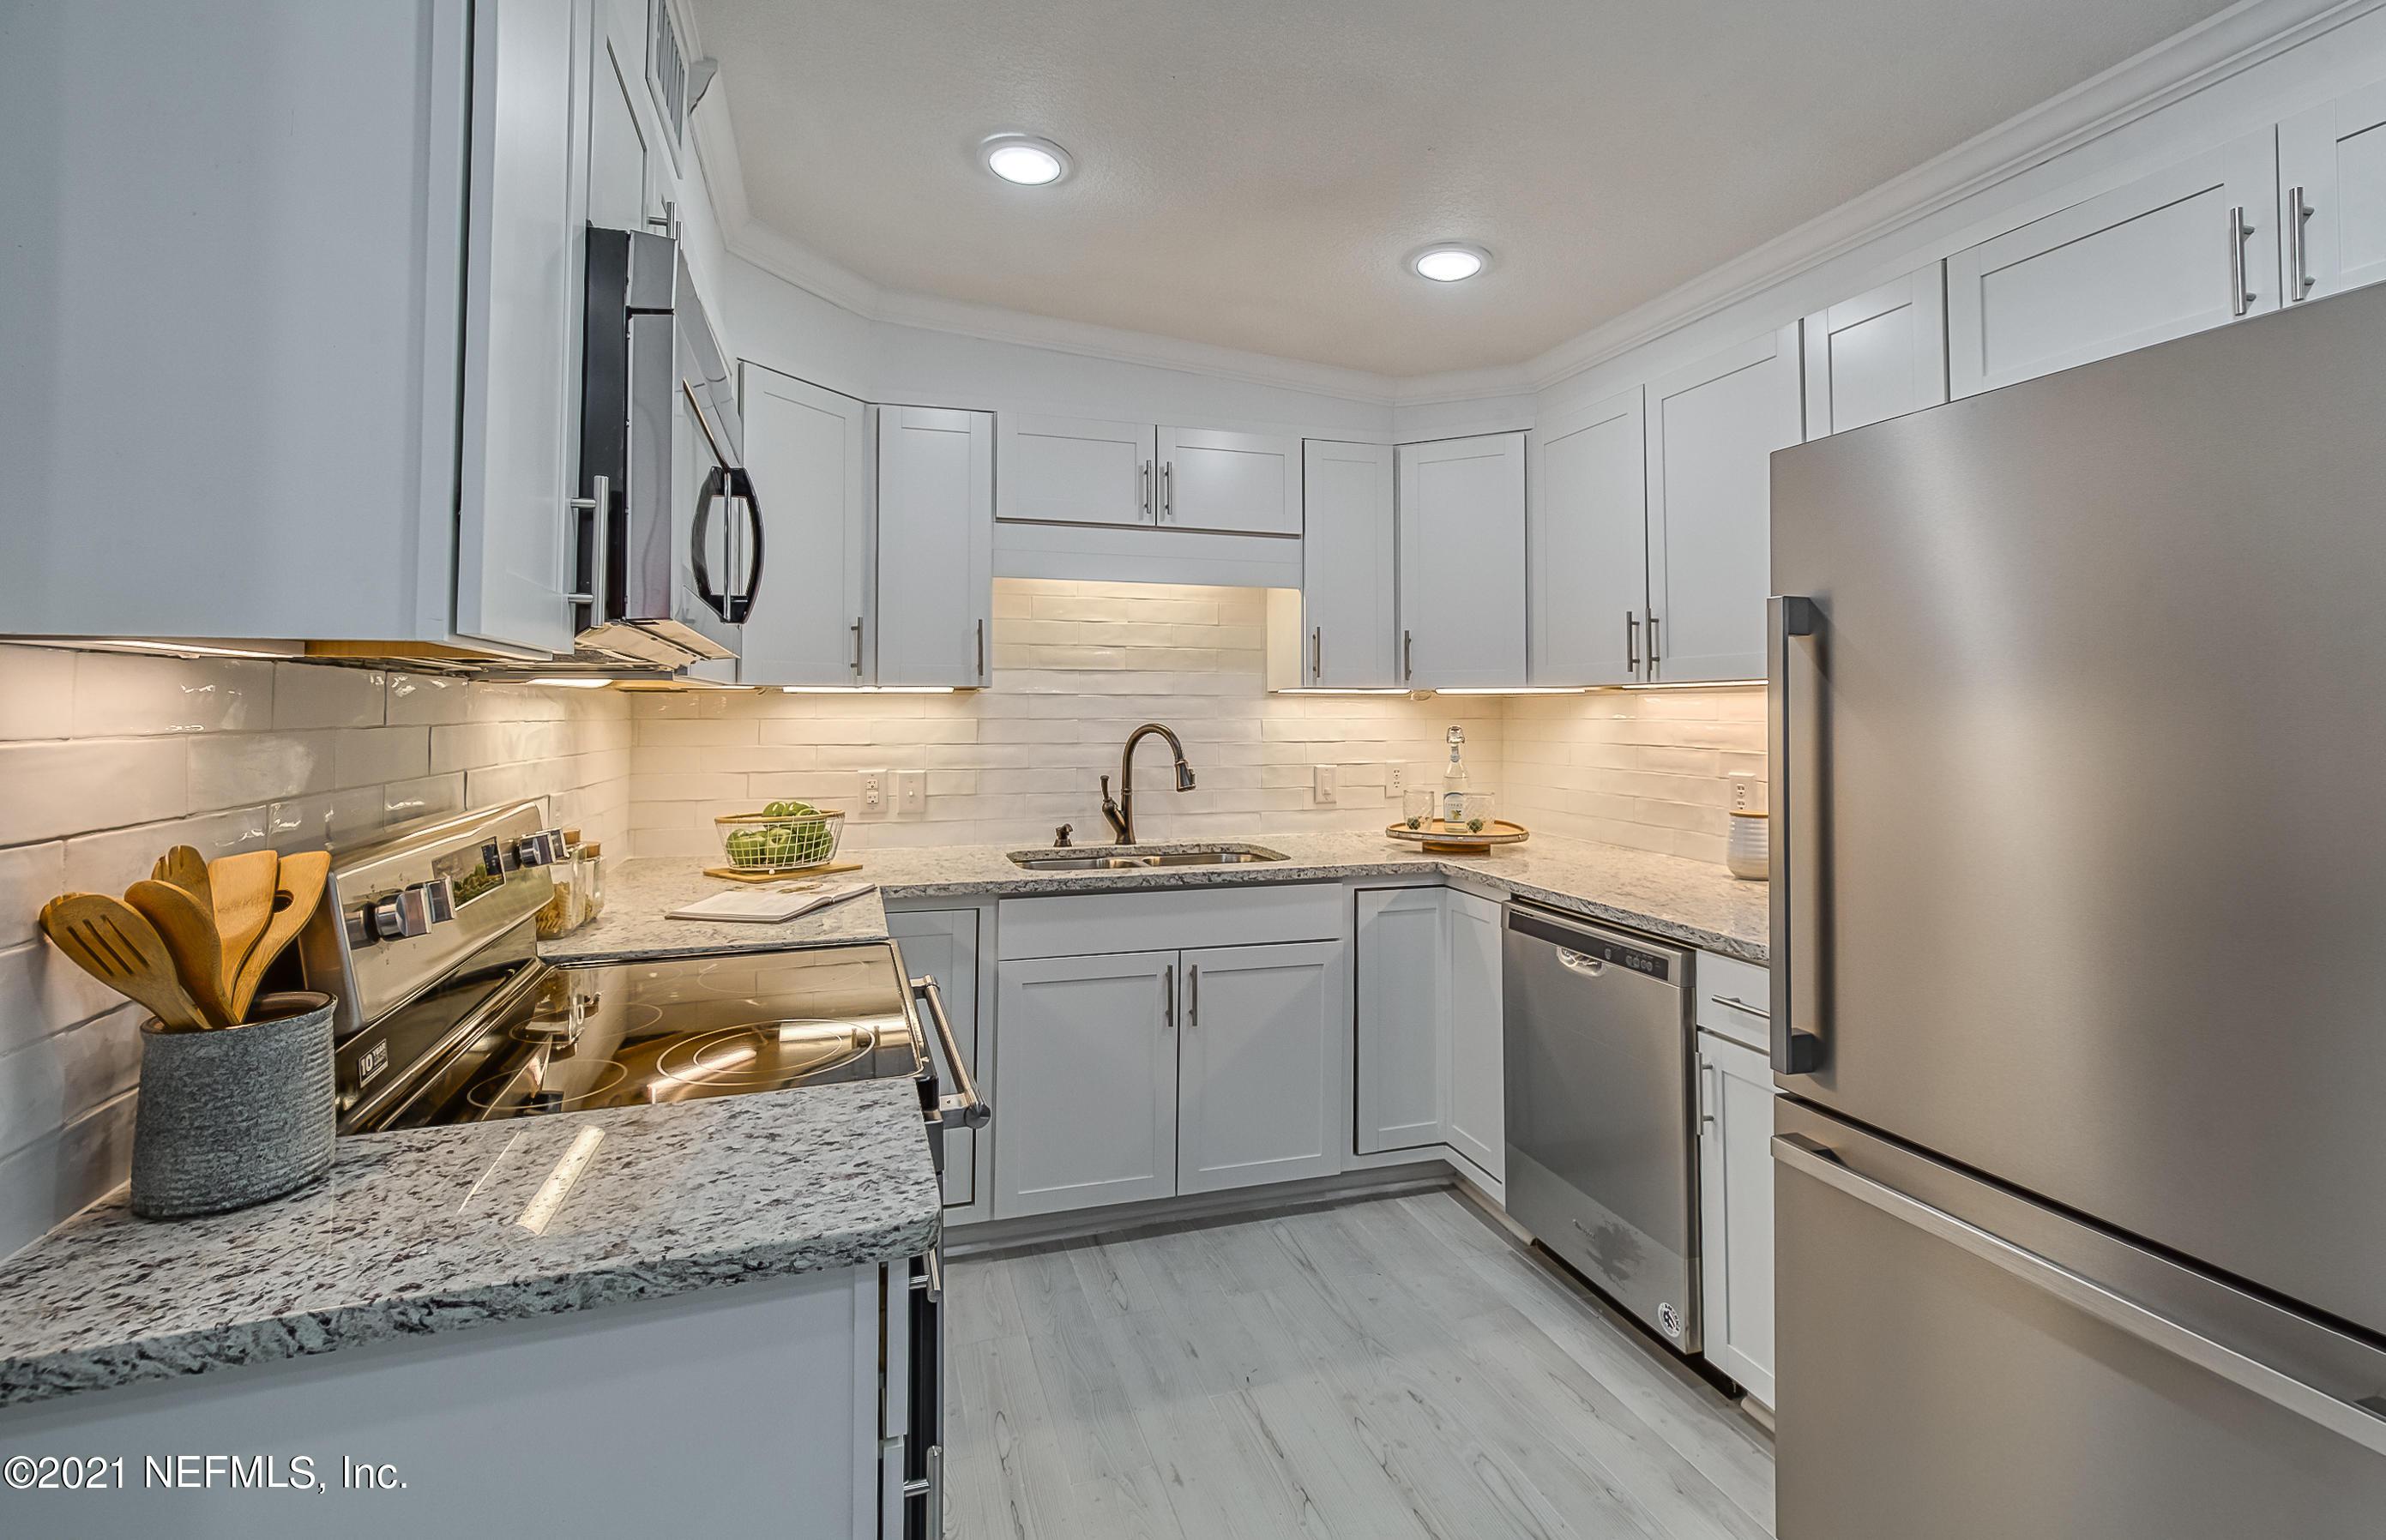 512 HAYTON, ORANGE PARK, FLORIDA 32073, 3 Bedrooms Bedrooms, ,2 BathroomsBathrooms,Residential,For sale,HAYTON,1123397